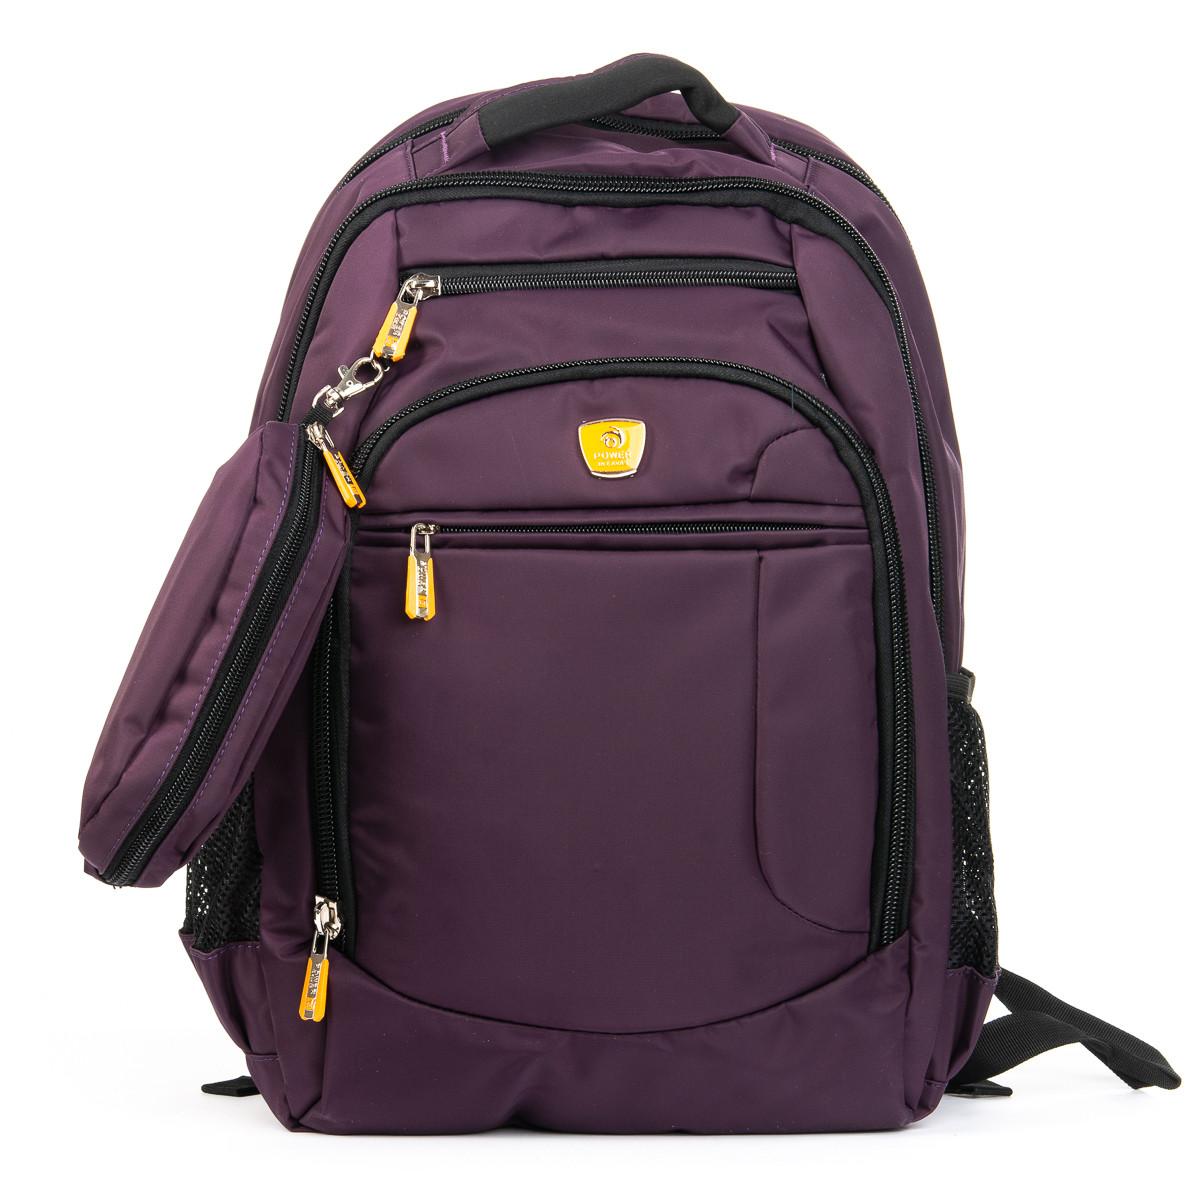 PODIUM Рюкзак Городской нейлон Power In Eavas 5143 purple